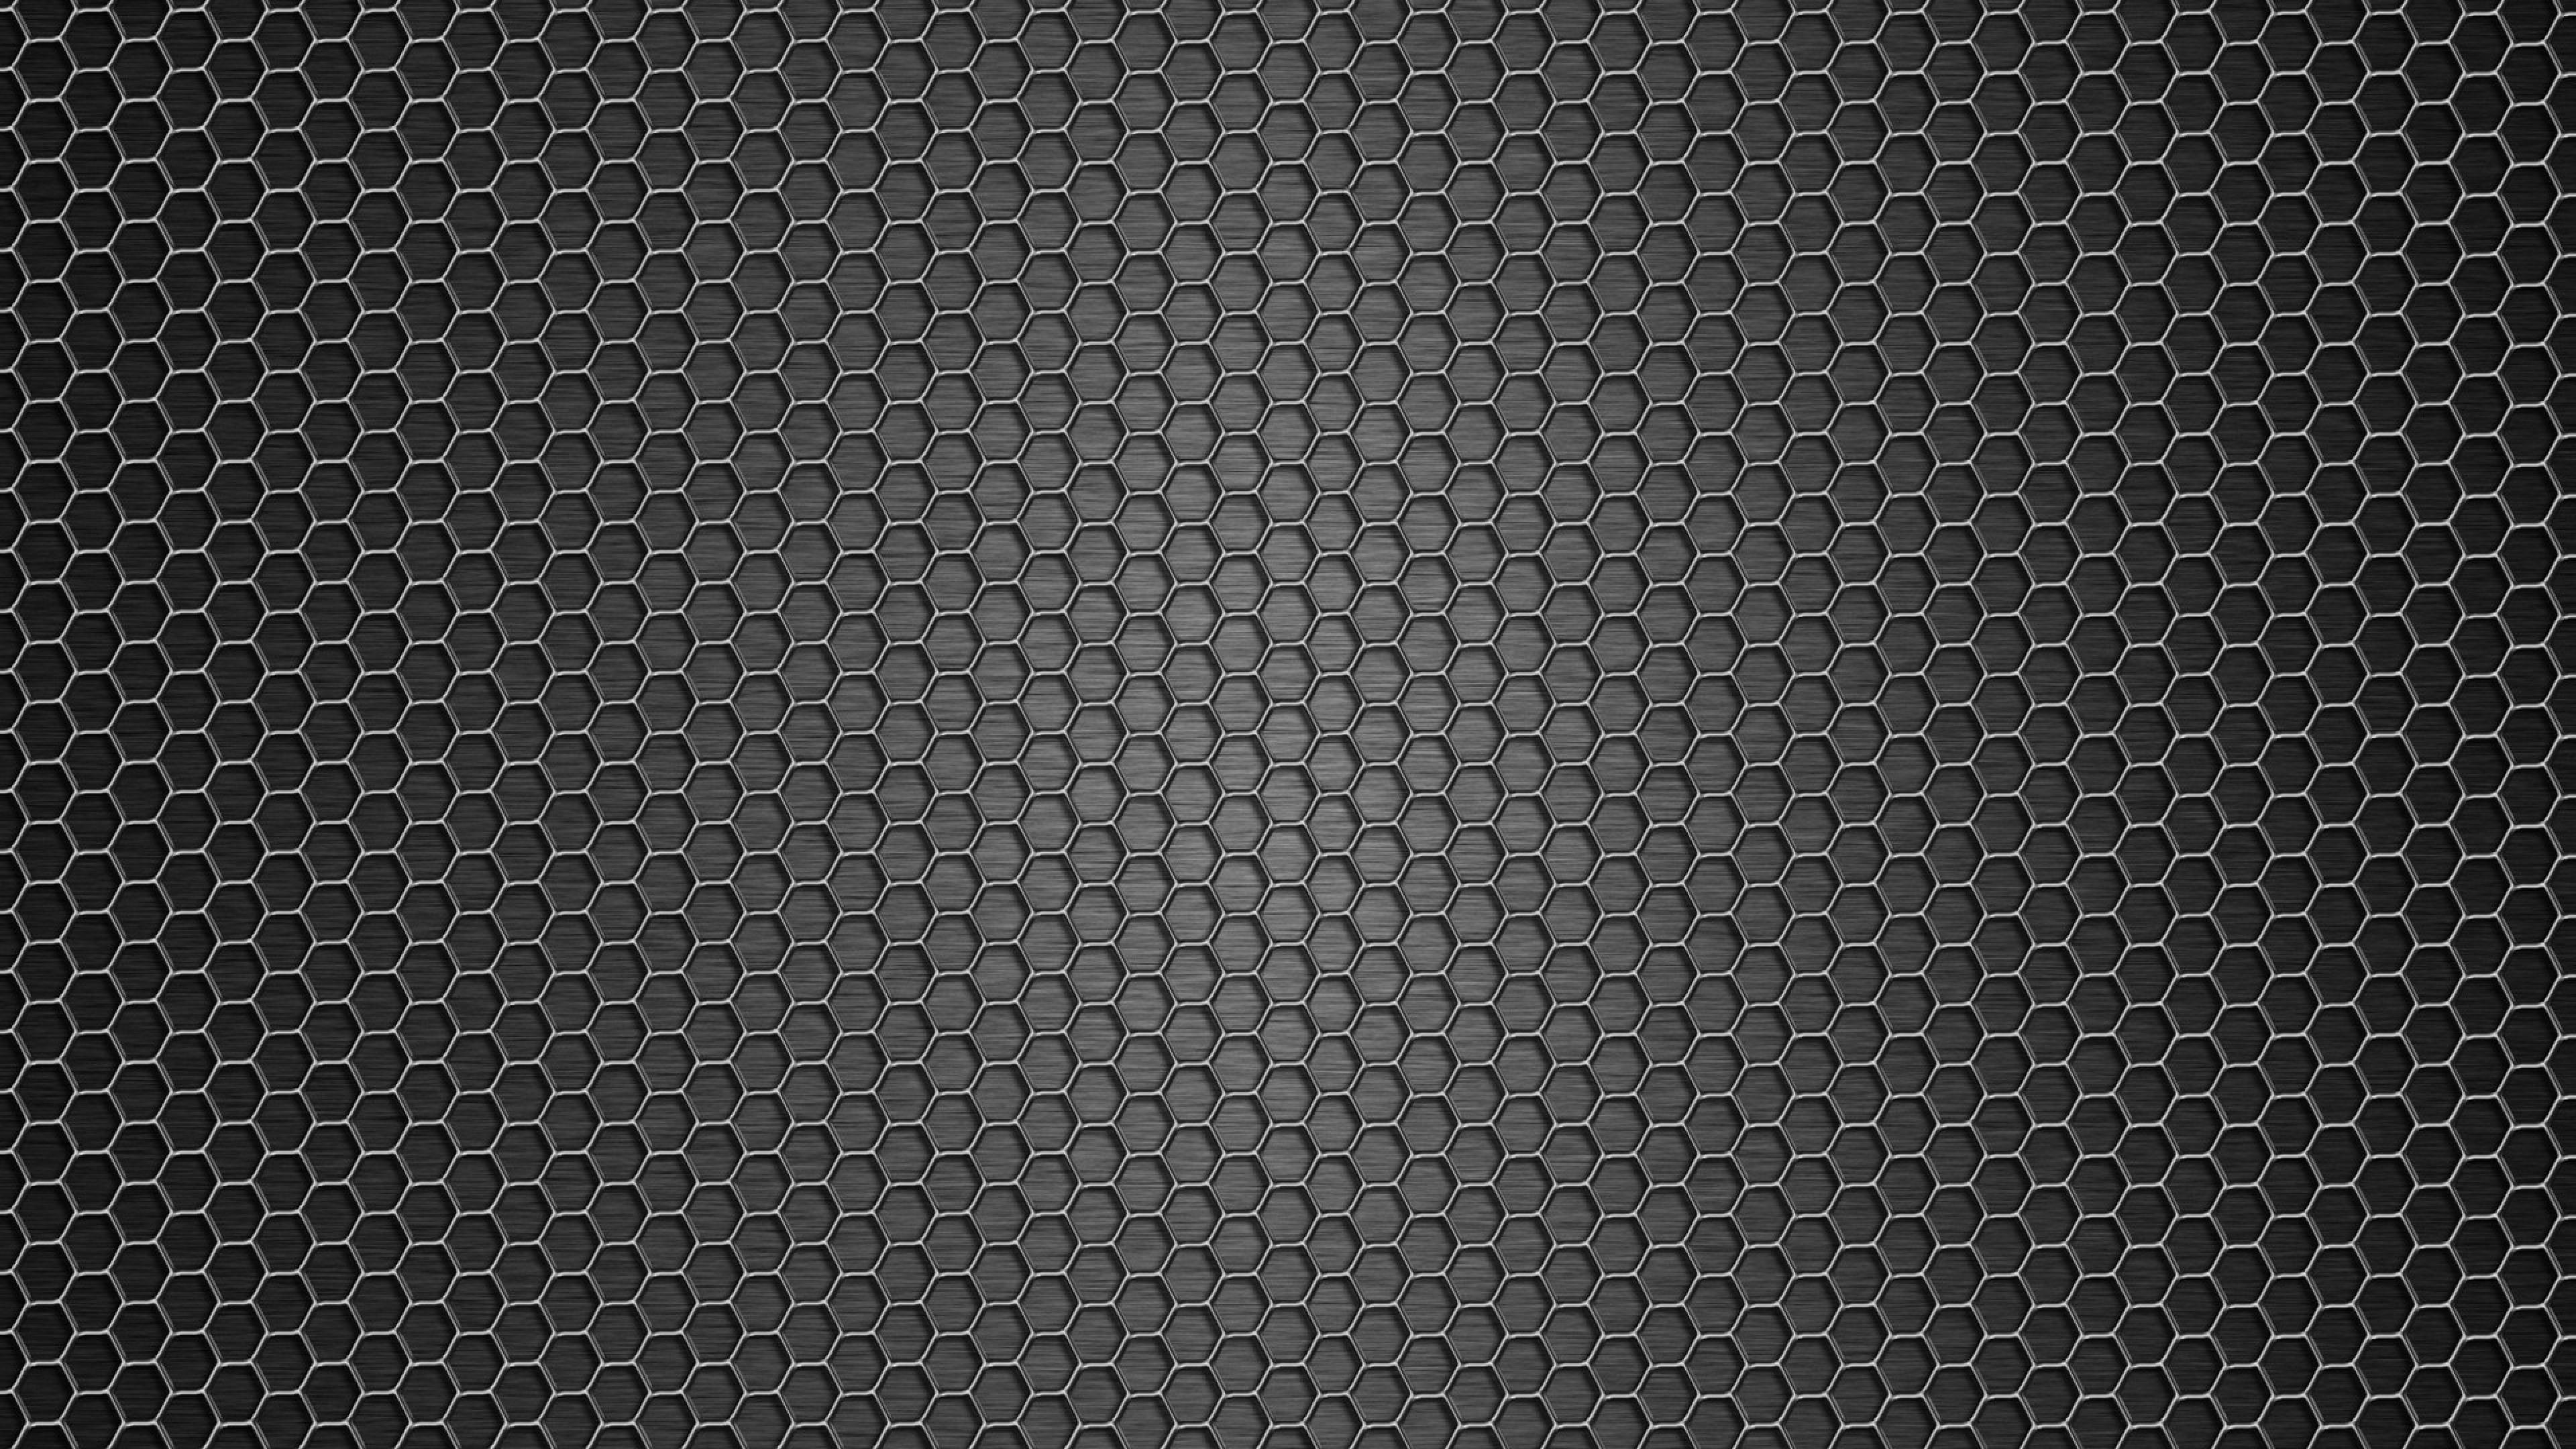 Dark Background Texture Metal Wallpaper Background 4K Ultra HD 3840x2160